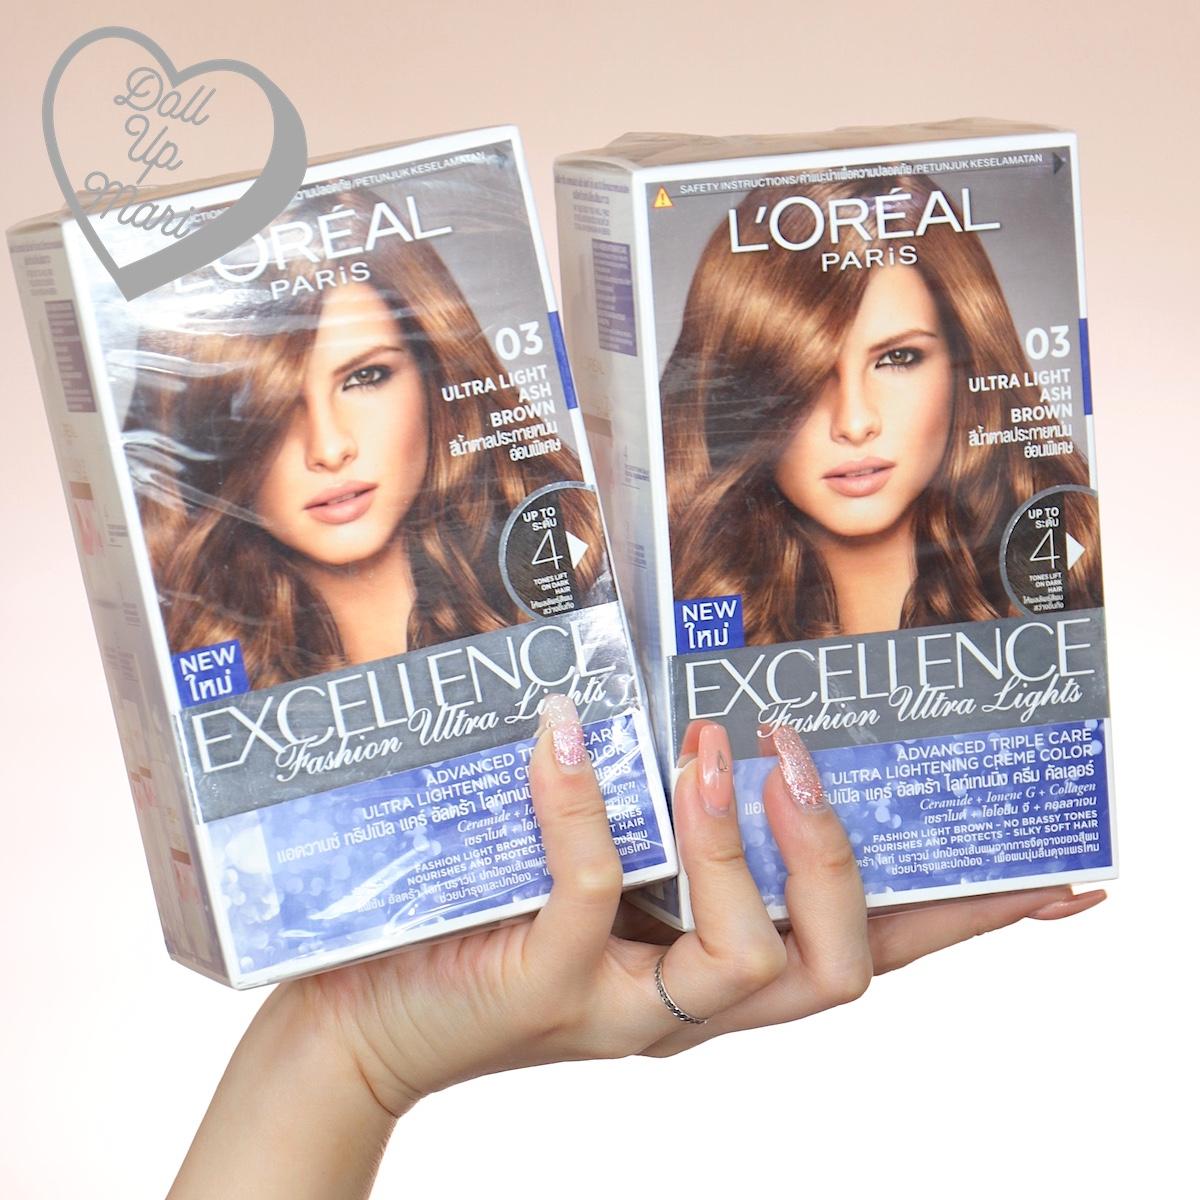 L'Oréal Excellence Fashion Ultra Lights (03 Ash Brown)